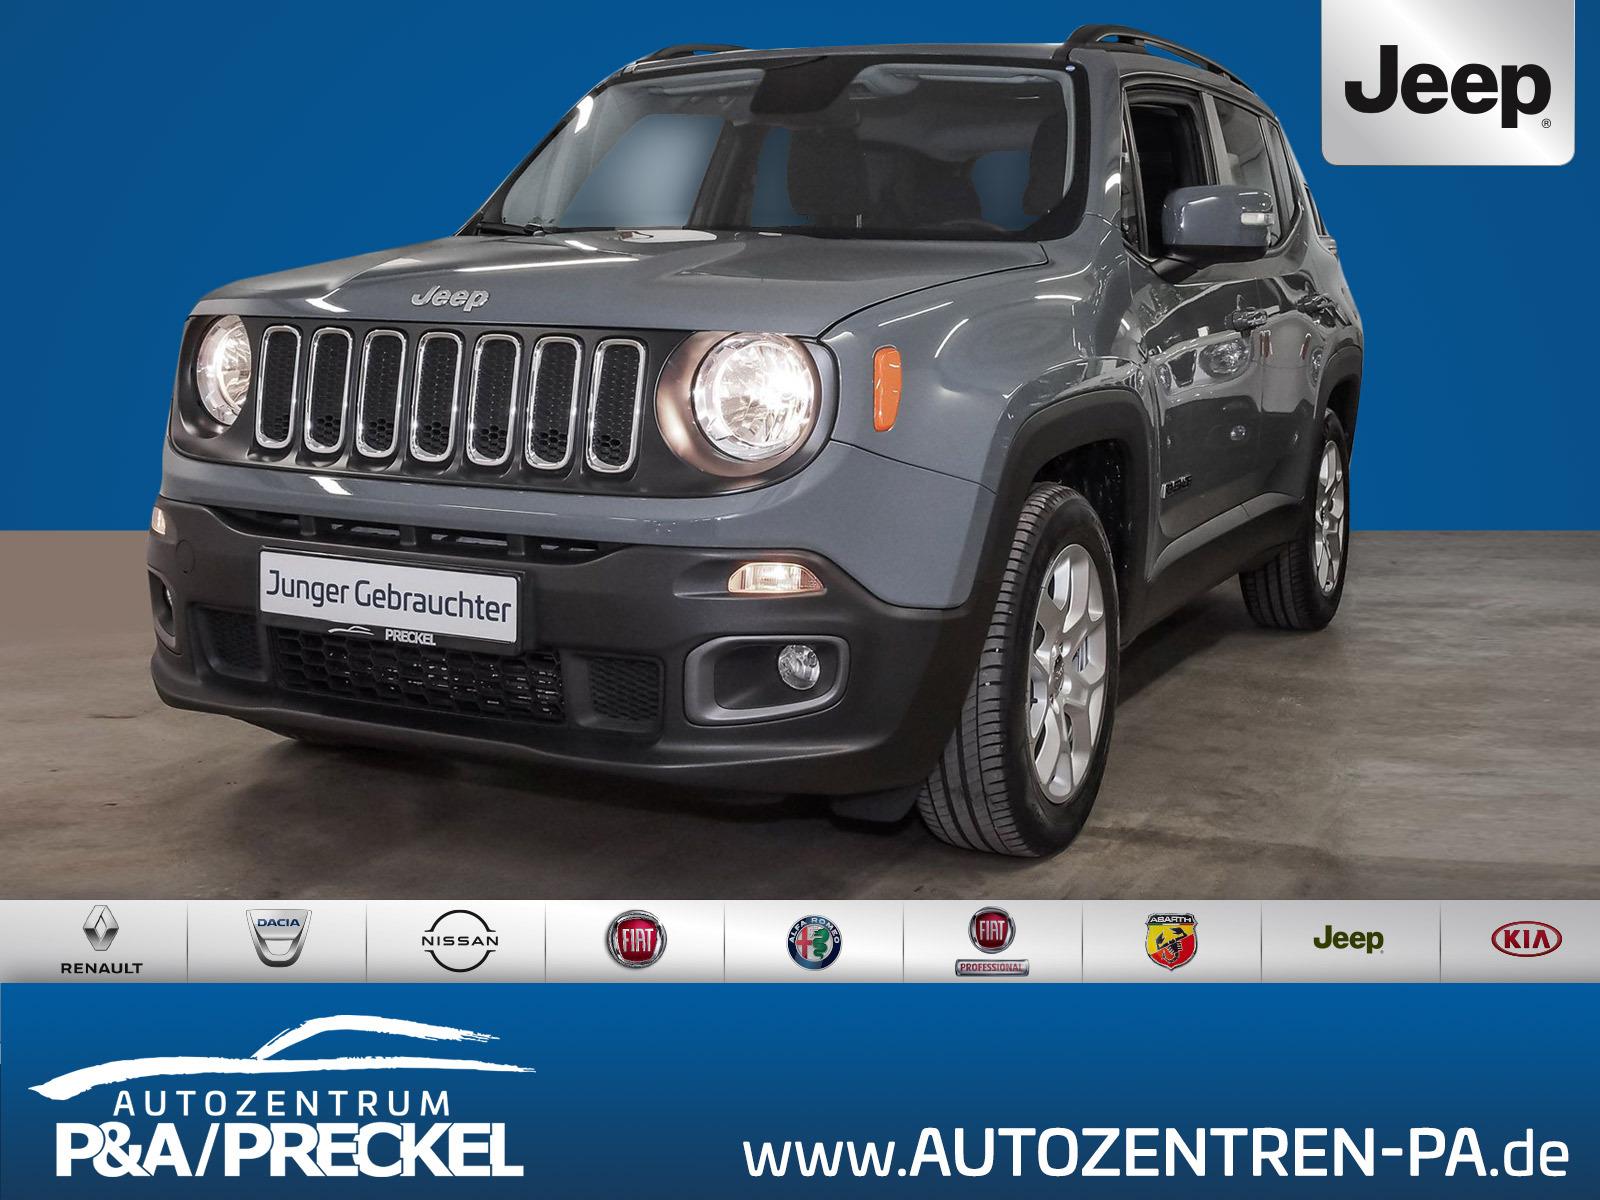 Jeep Renegade 1.4 MultiAir Longitude /Automatik / Klima / Navi /SHZ / PDC / LM-Felgen, Jahr 2017, Benzin